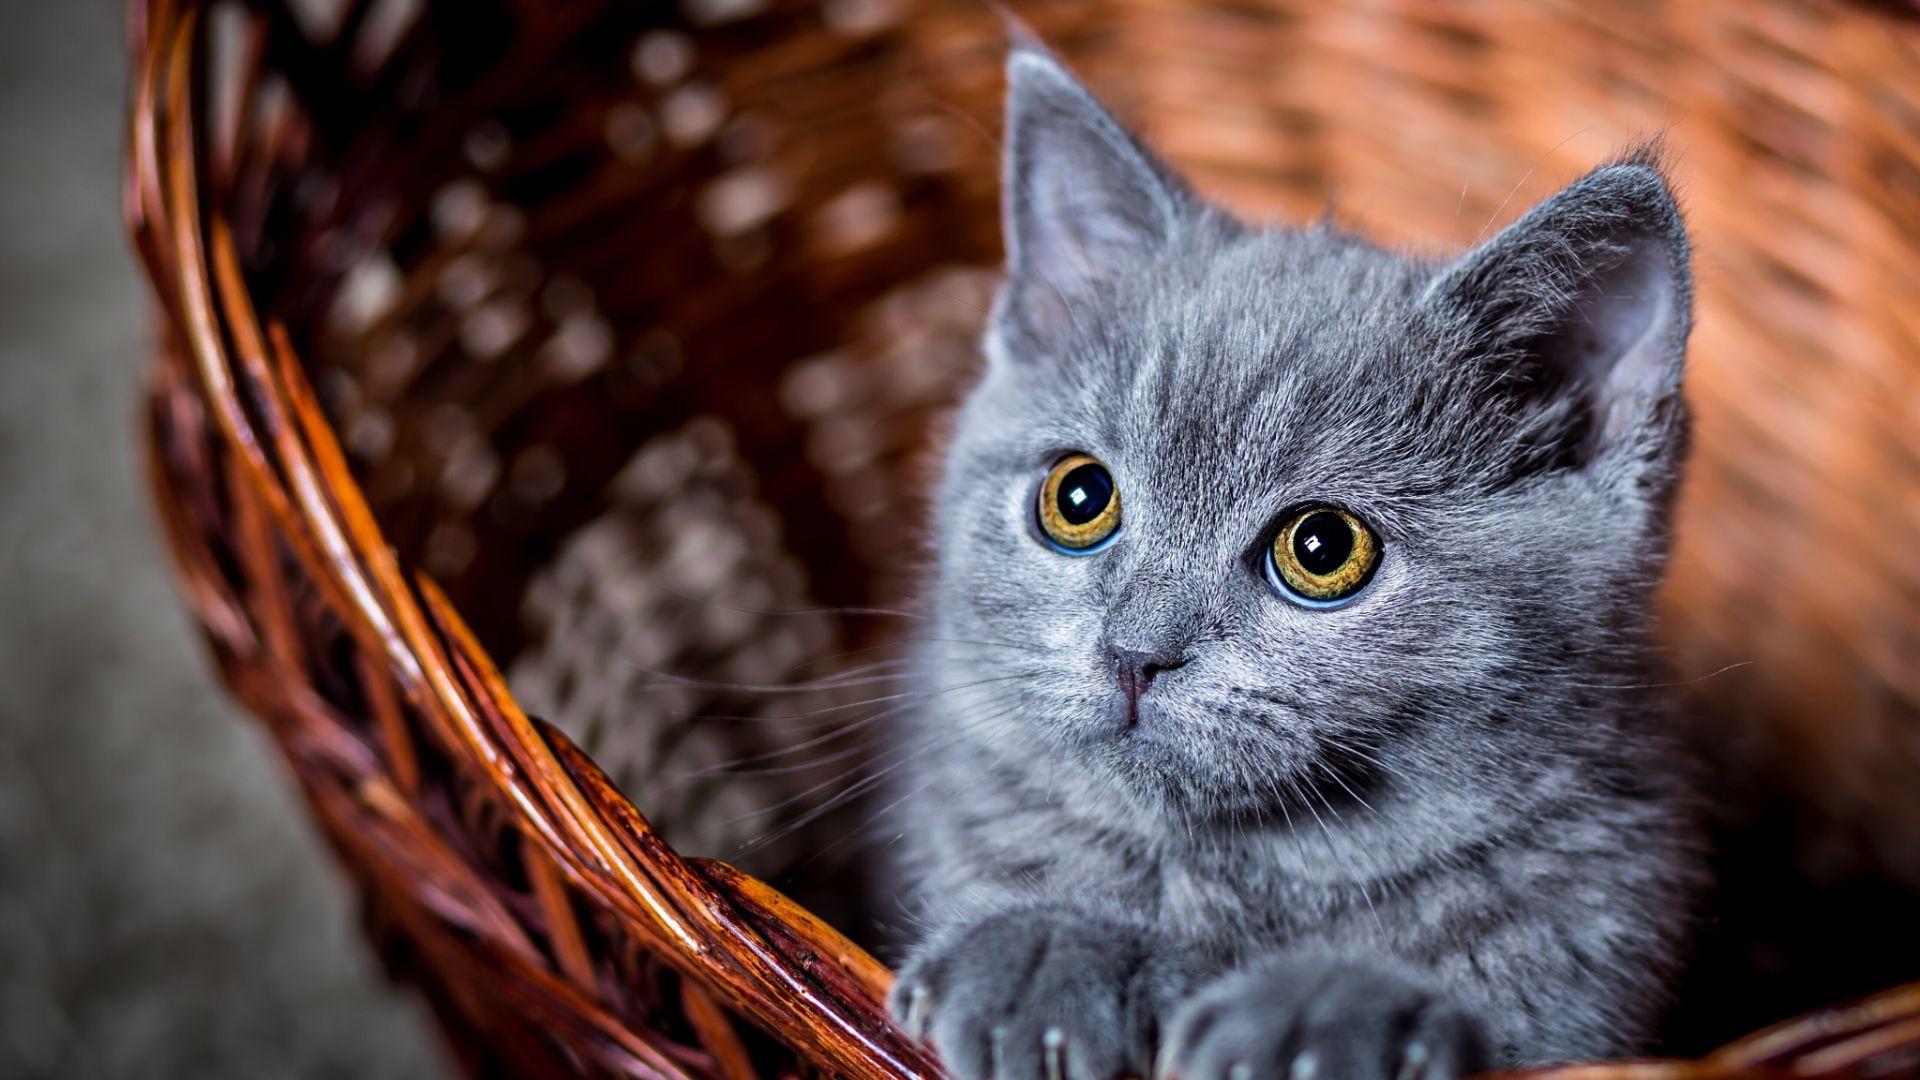 Wallpaper Kitten in basket, baby animal